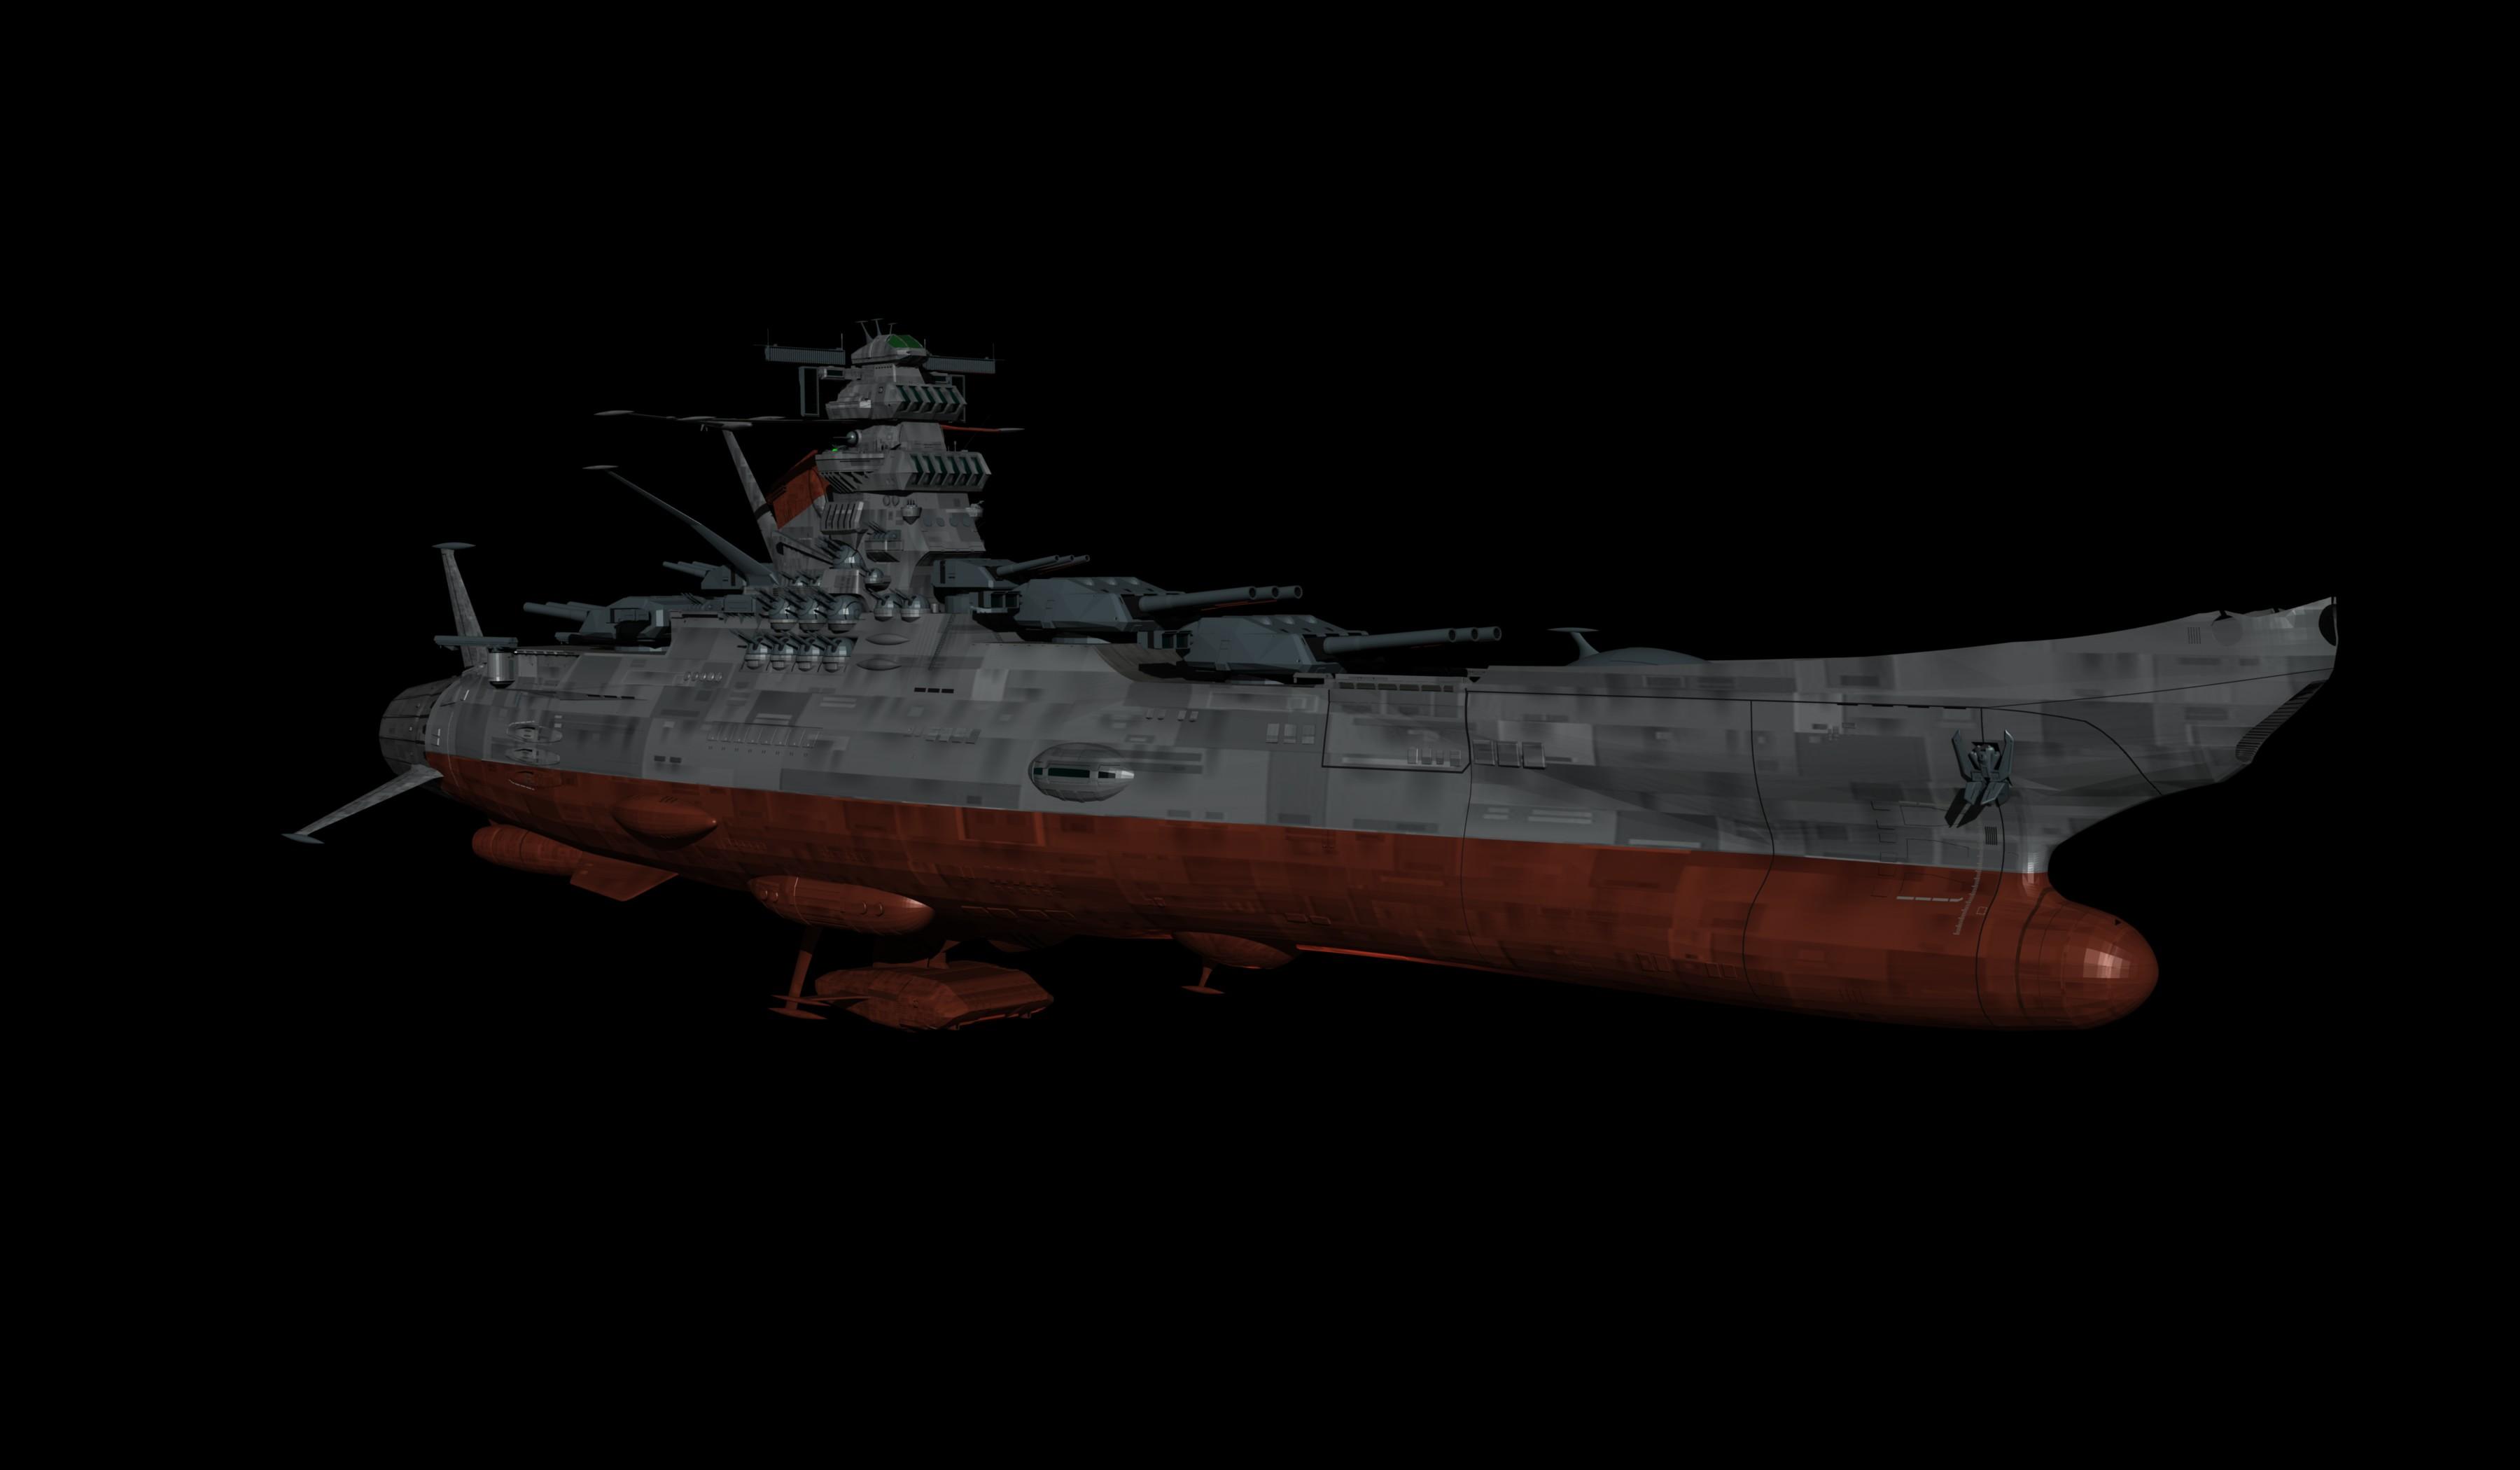 Space Battleship Yamato Cake Ideas And Designs